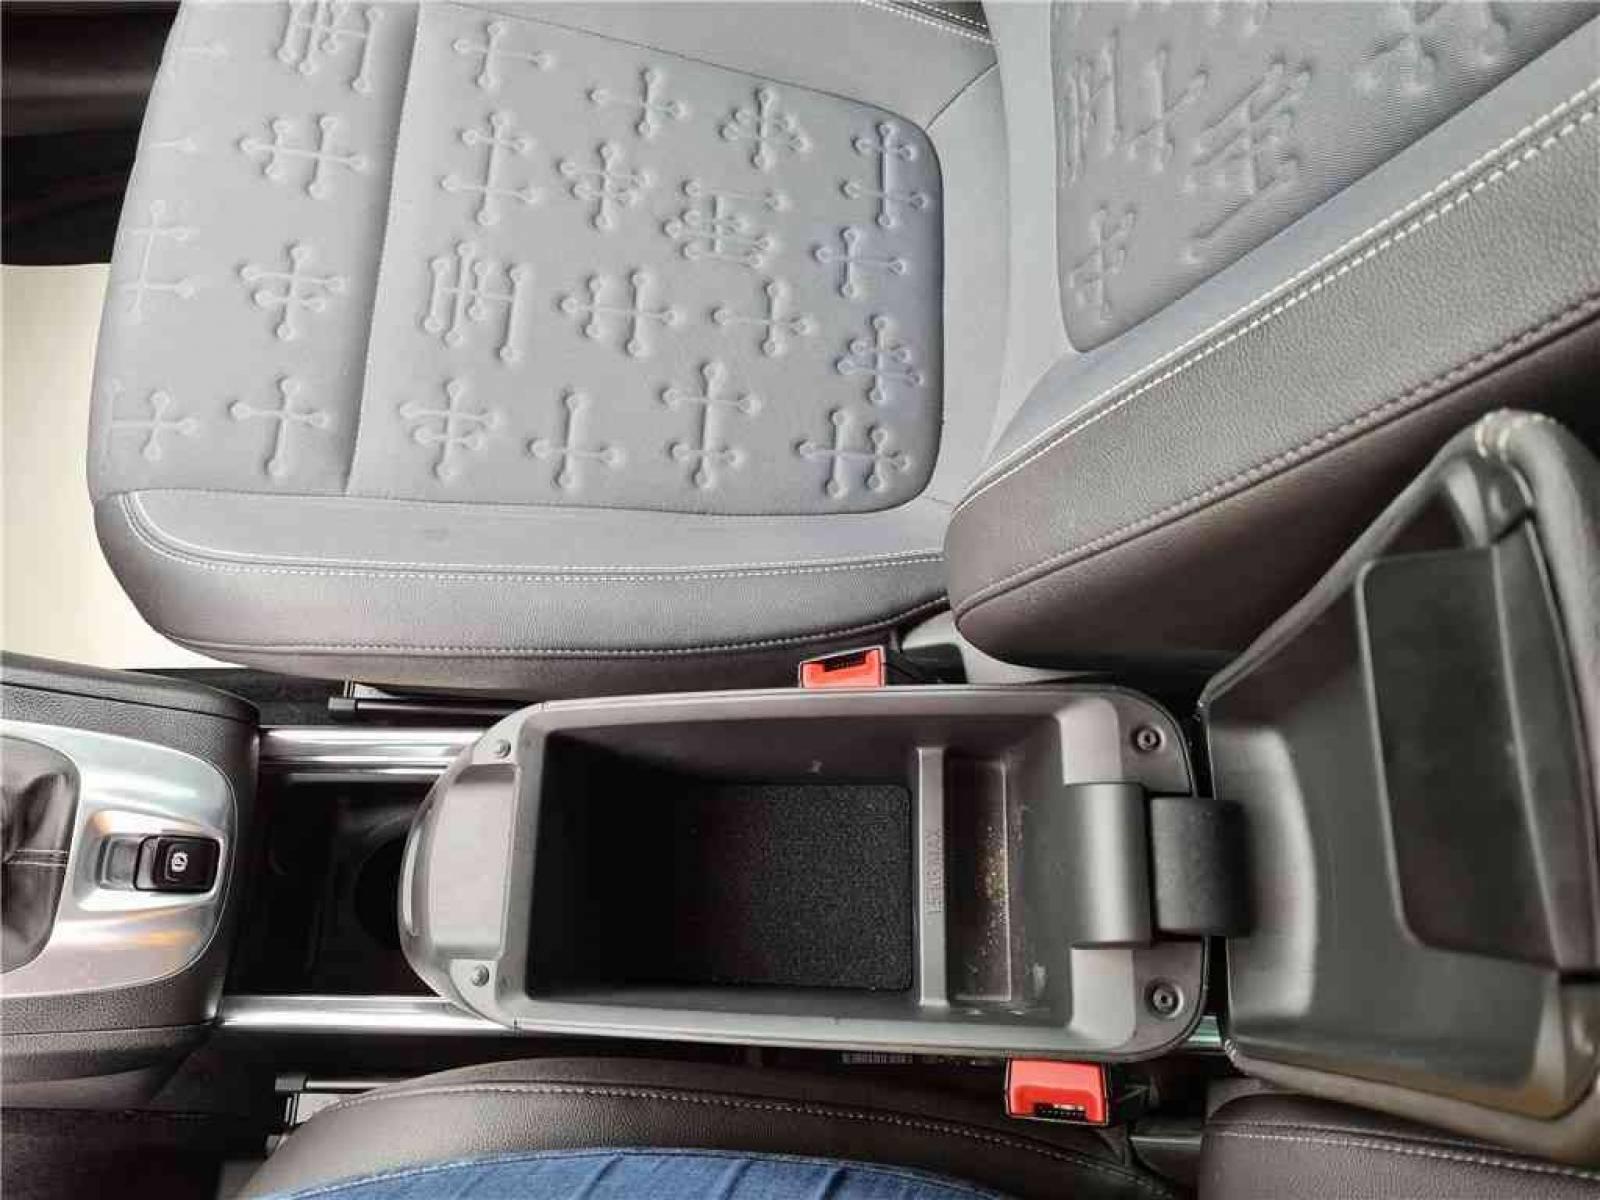 OPEL Meriva 1.6 CDTI - 110 ch Start/Stop - véhicule d'occasion - Groupe Guillet - Opel Magicauto - Chalon-sur-Saône - 71380 - Saint-Marcel - 44